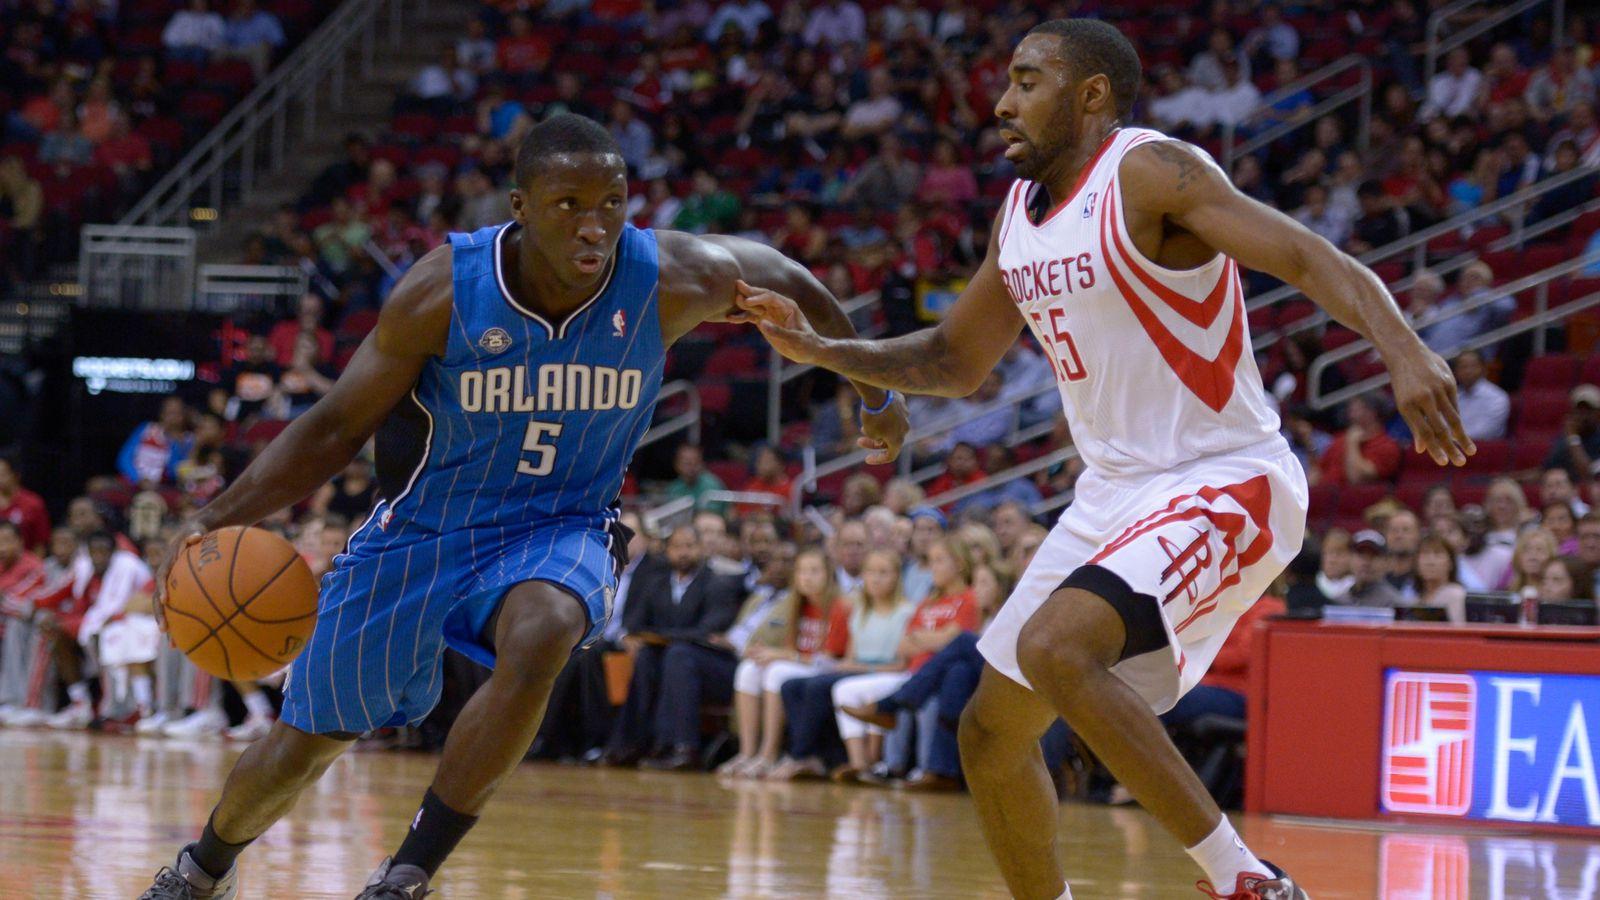 Houston Rockets finalize roster, cut Reggie Williams - The ...